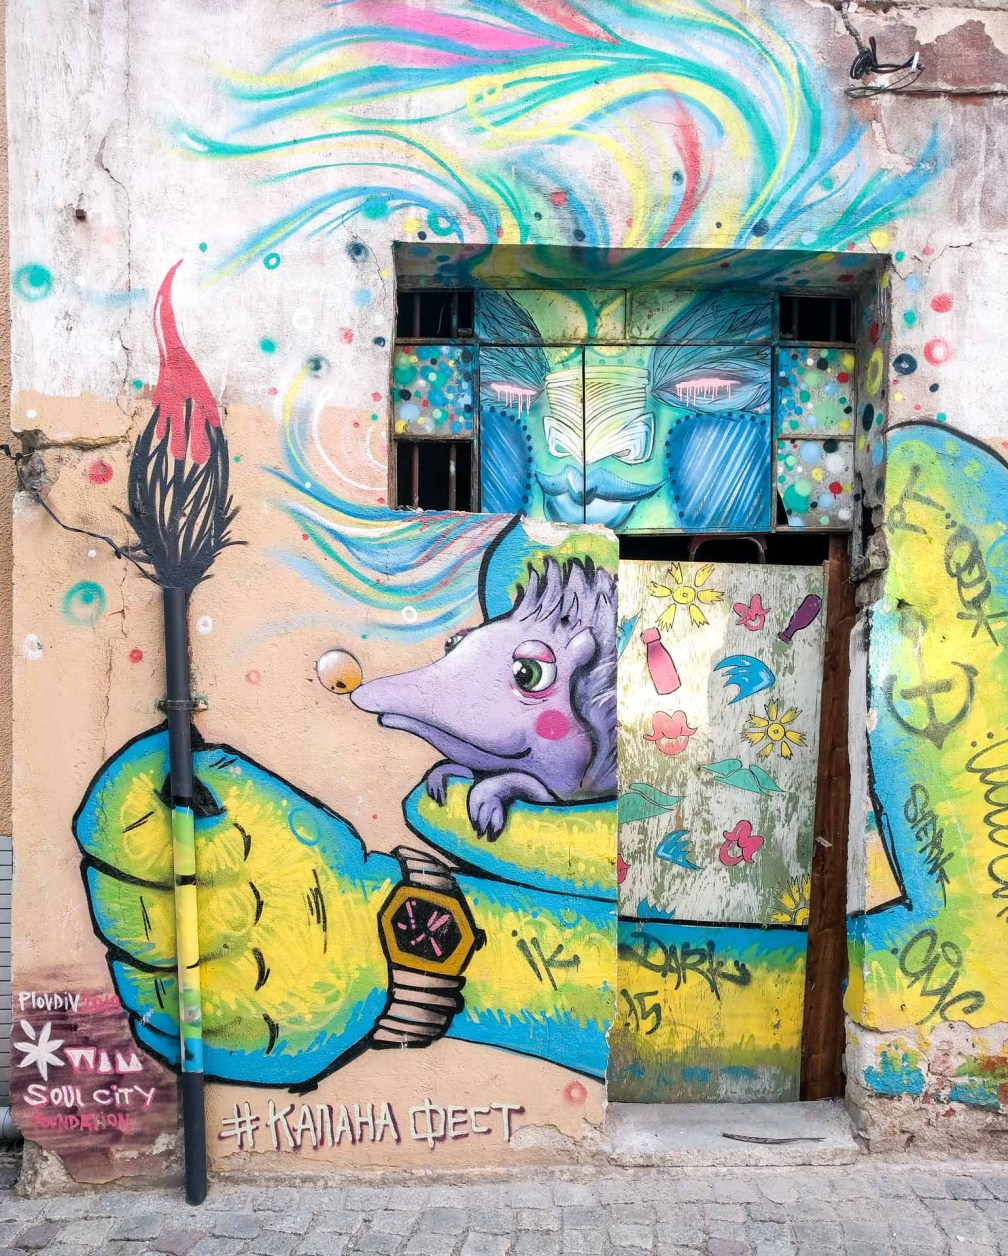 Kapana street art